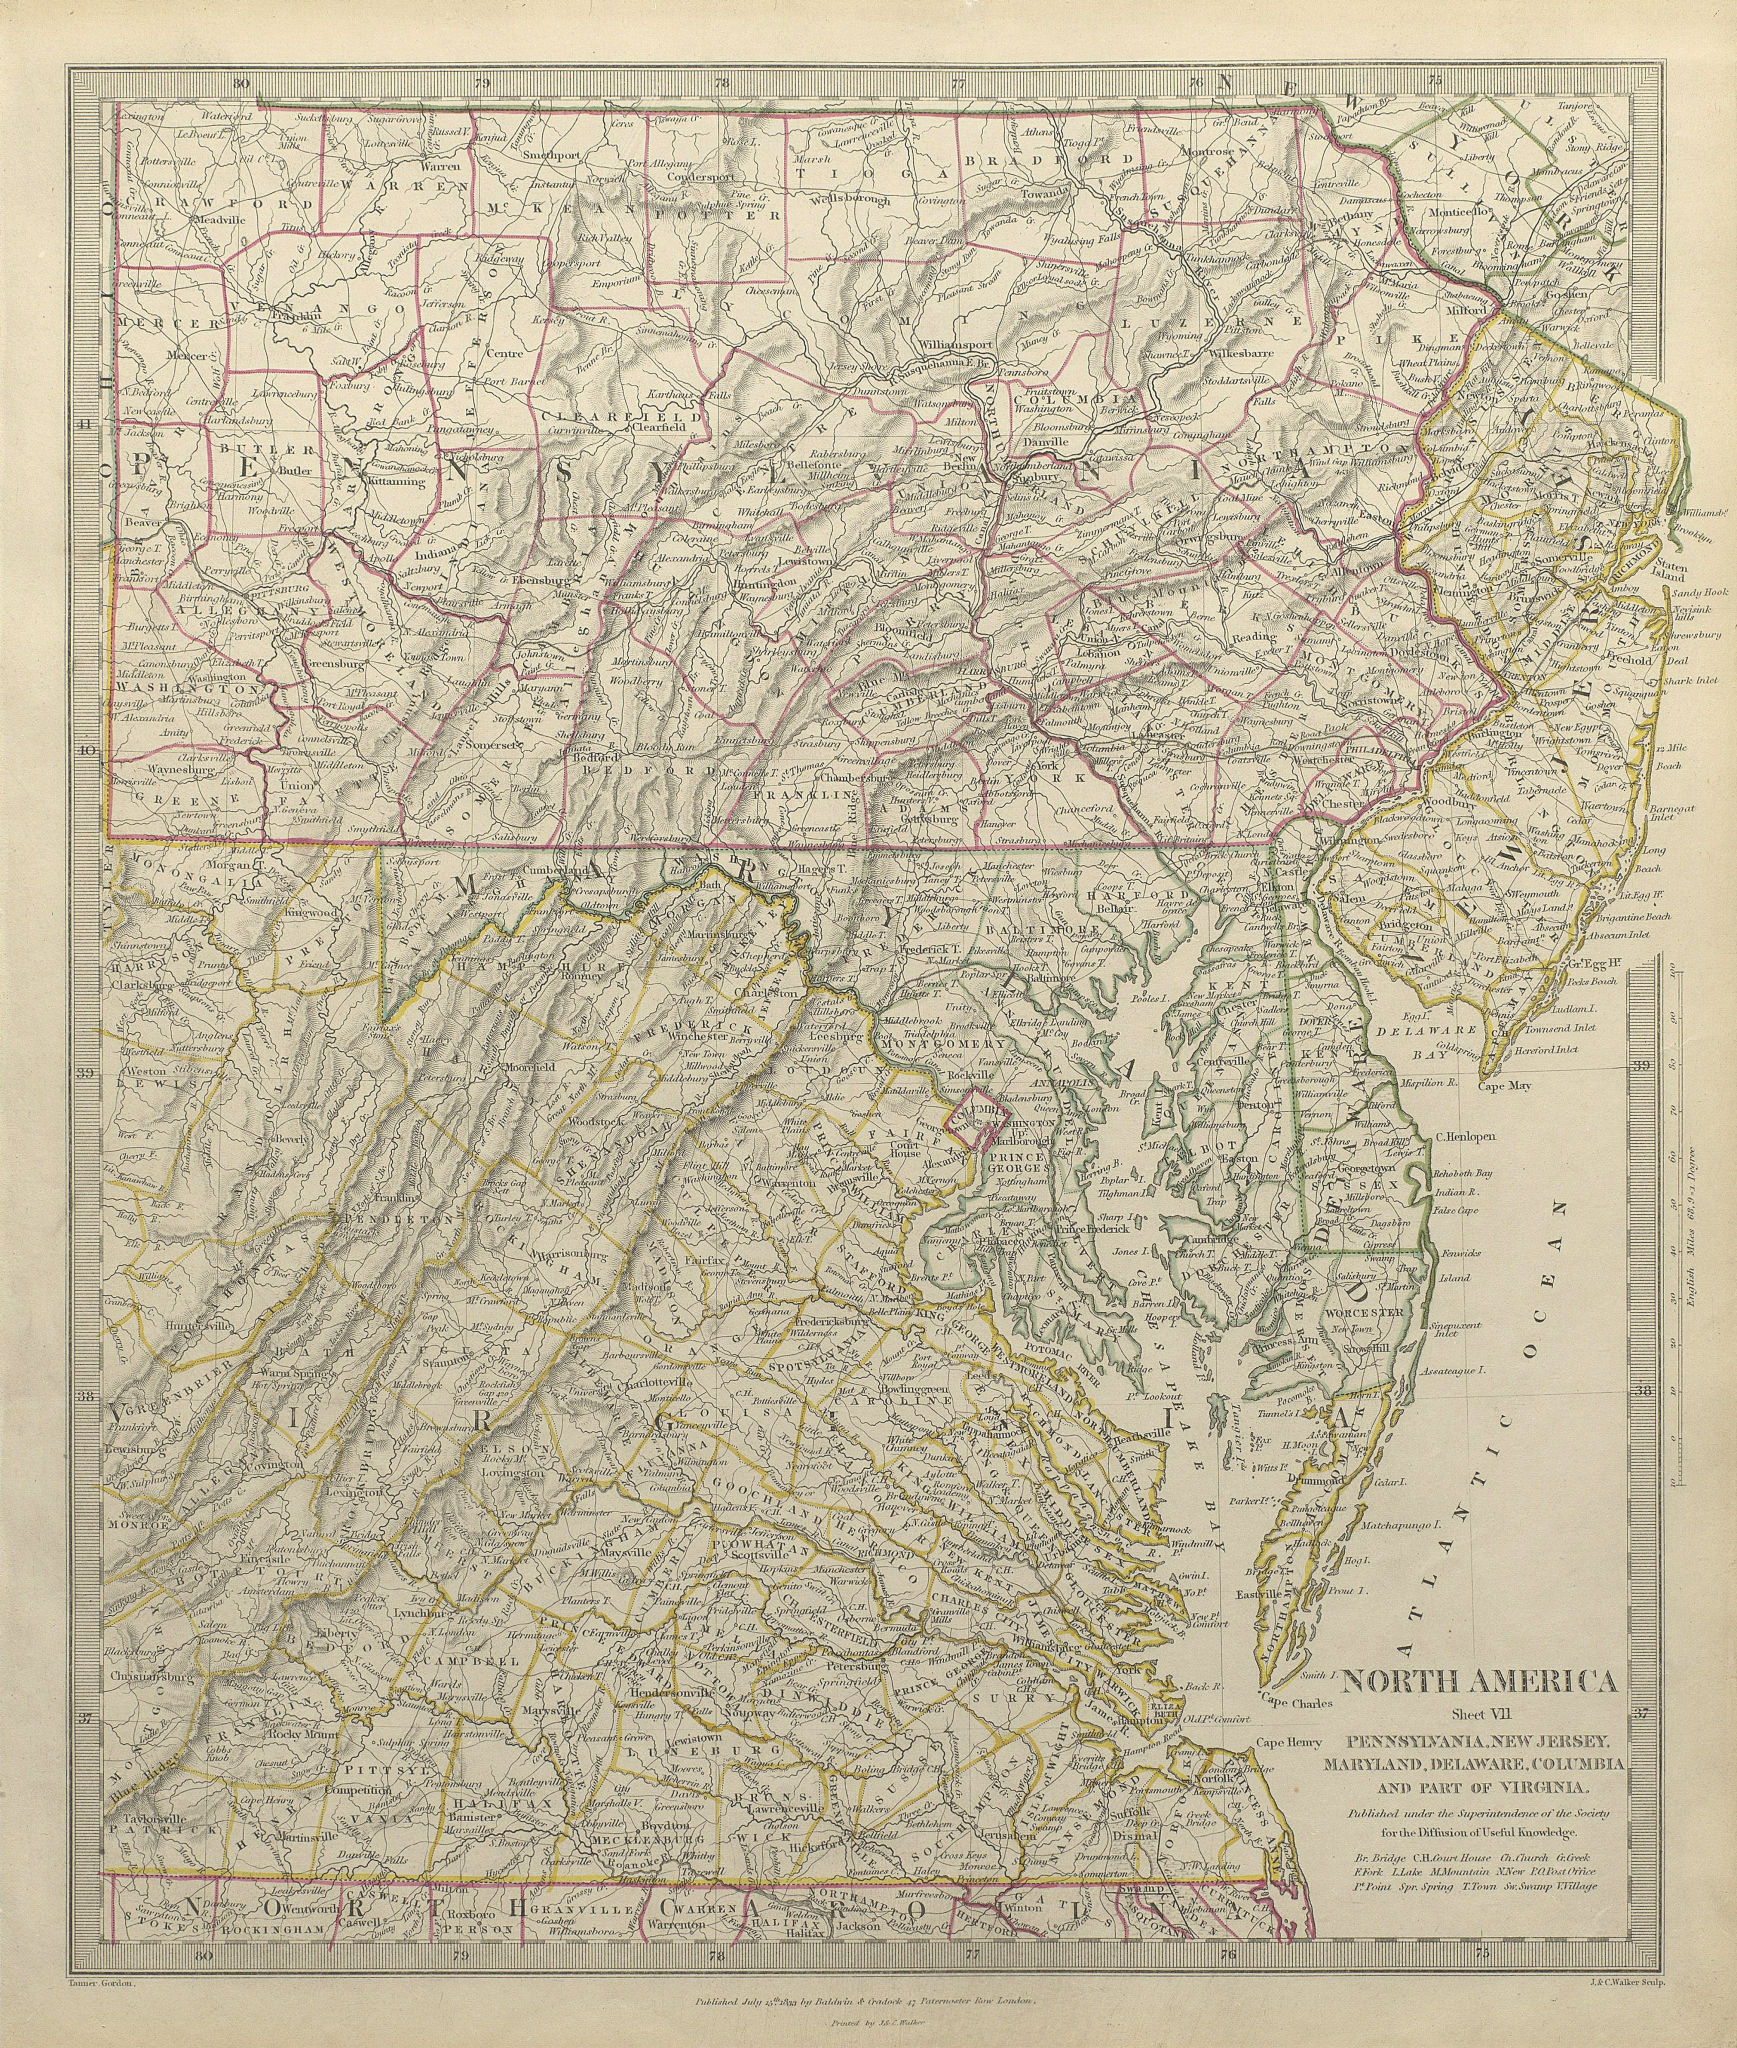 Associate Product USA. Pennsylvania New Jersey Maryland Delaware DC Virginia. SDUK 1844 old map